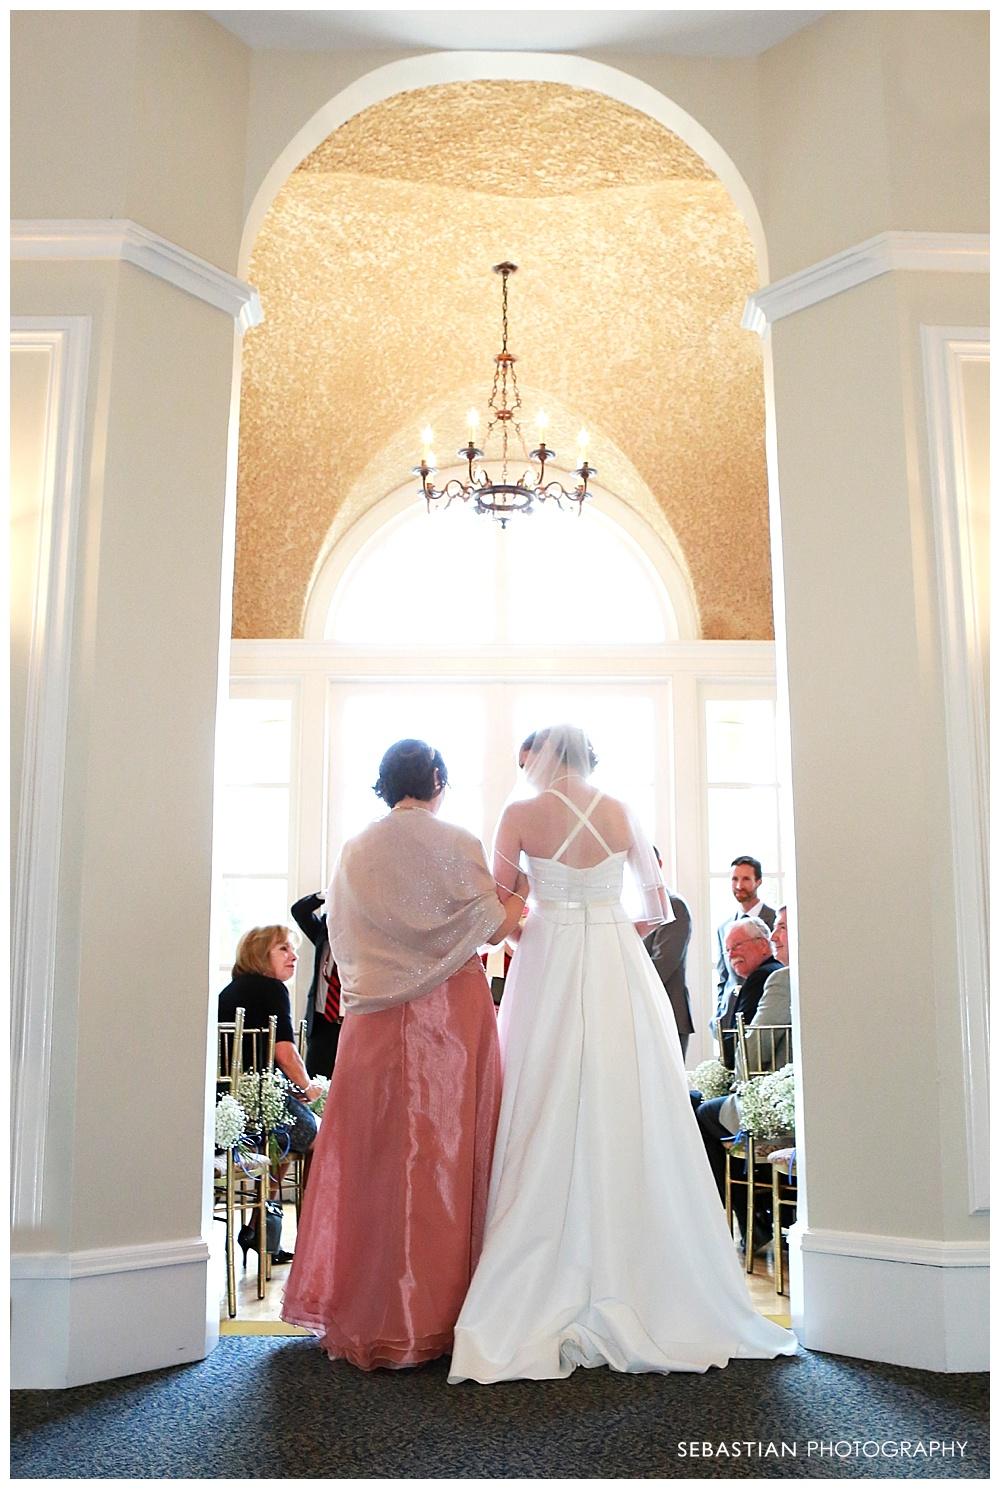 Sebastian_Photography_Wadsworth_Mansion_Middletown_CT_Wedding_Portraits_Spring27.jpg